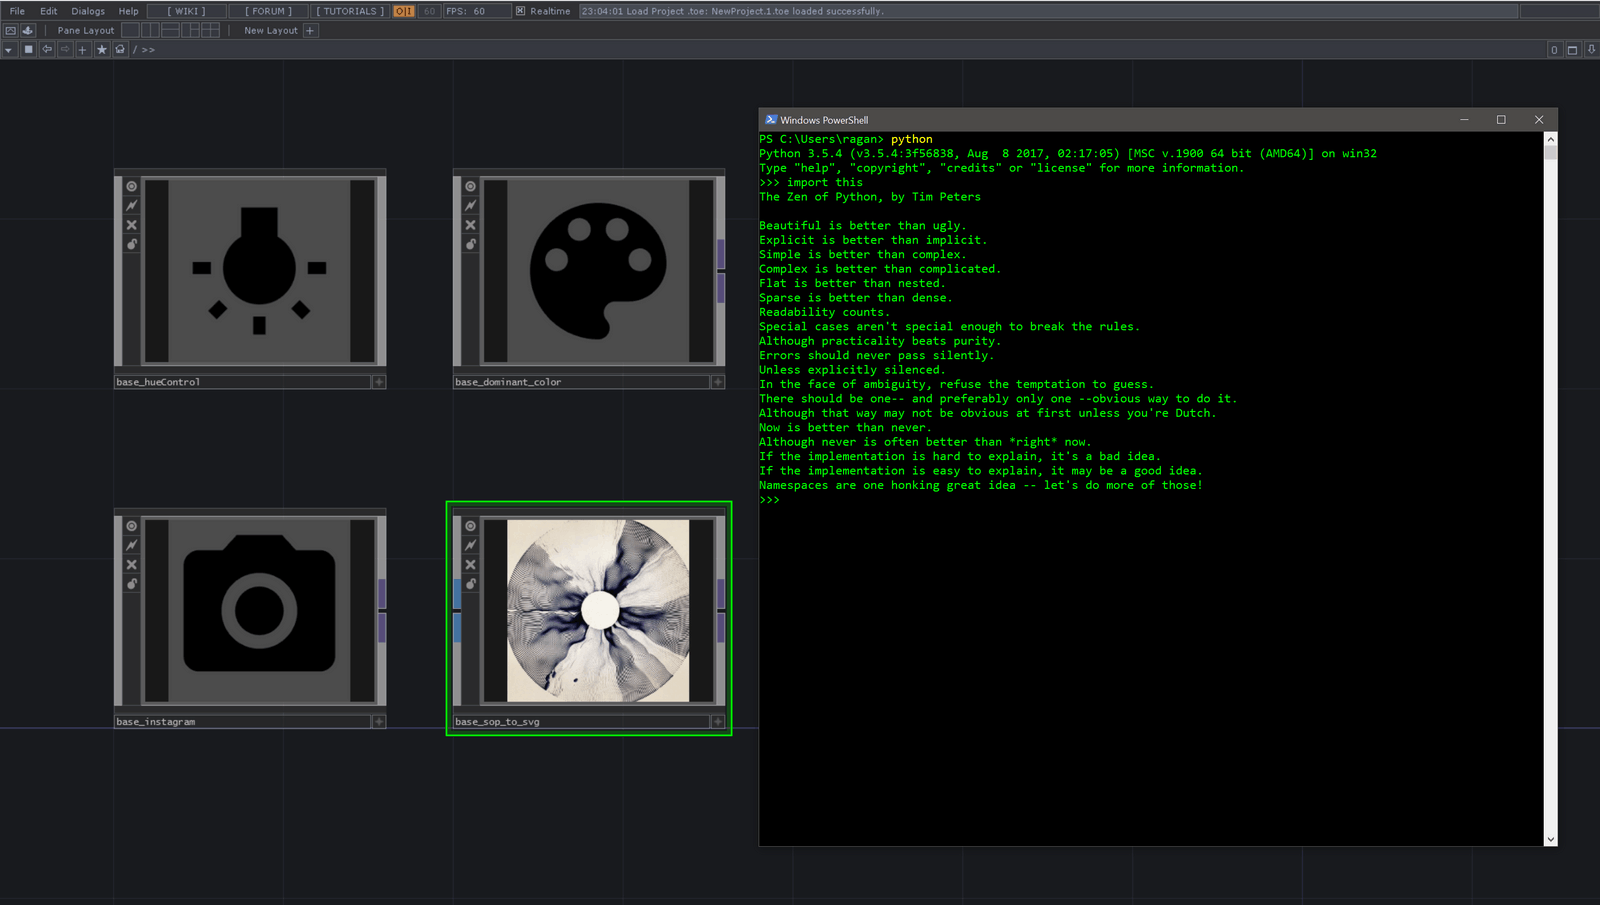 5cd4343bd94ad4825874c7cd_Matthew Ragan and Zoe Sandoval Workshop (Python).jpg-p-1600.png